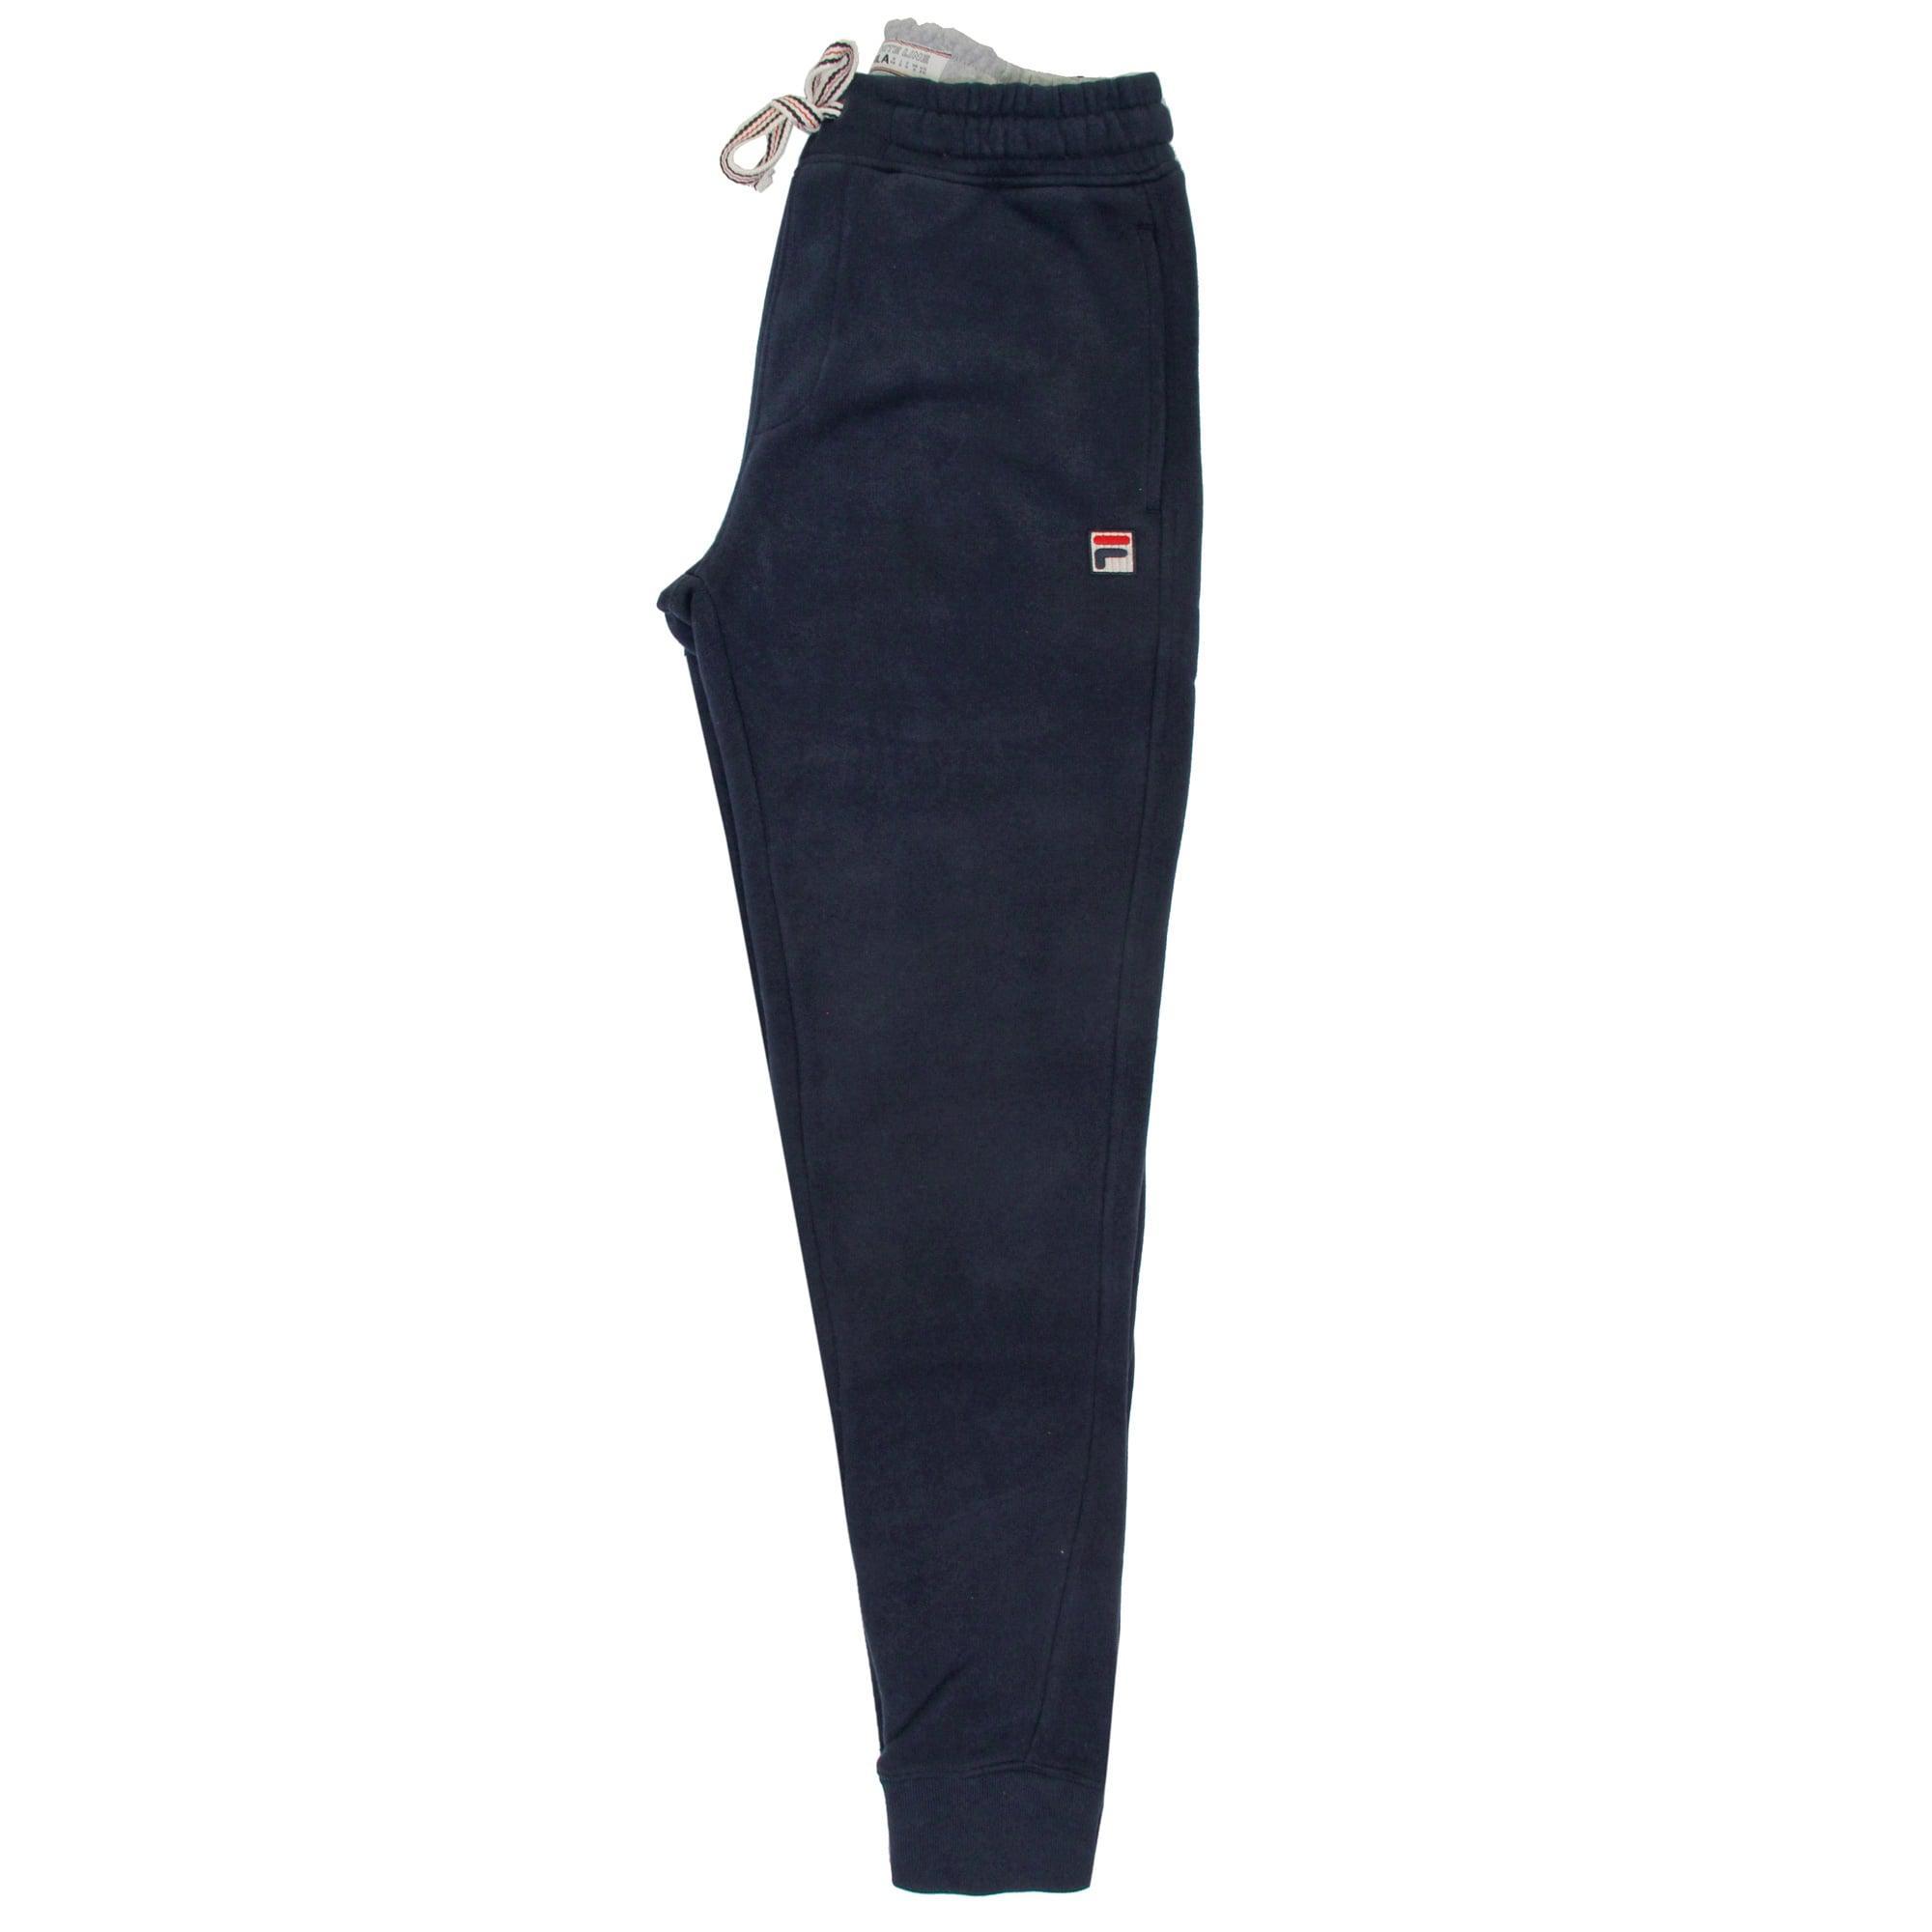 8d25b1661753 Lyst - Fila Vintage Livata Peacoat Track Pants in Blue